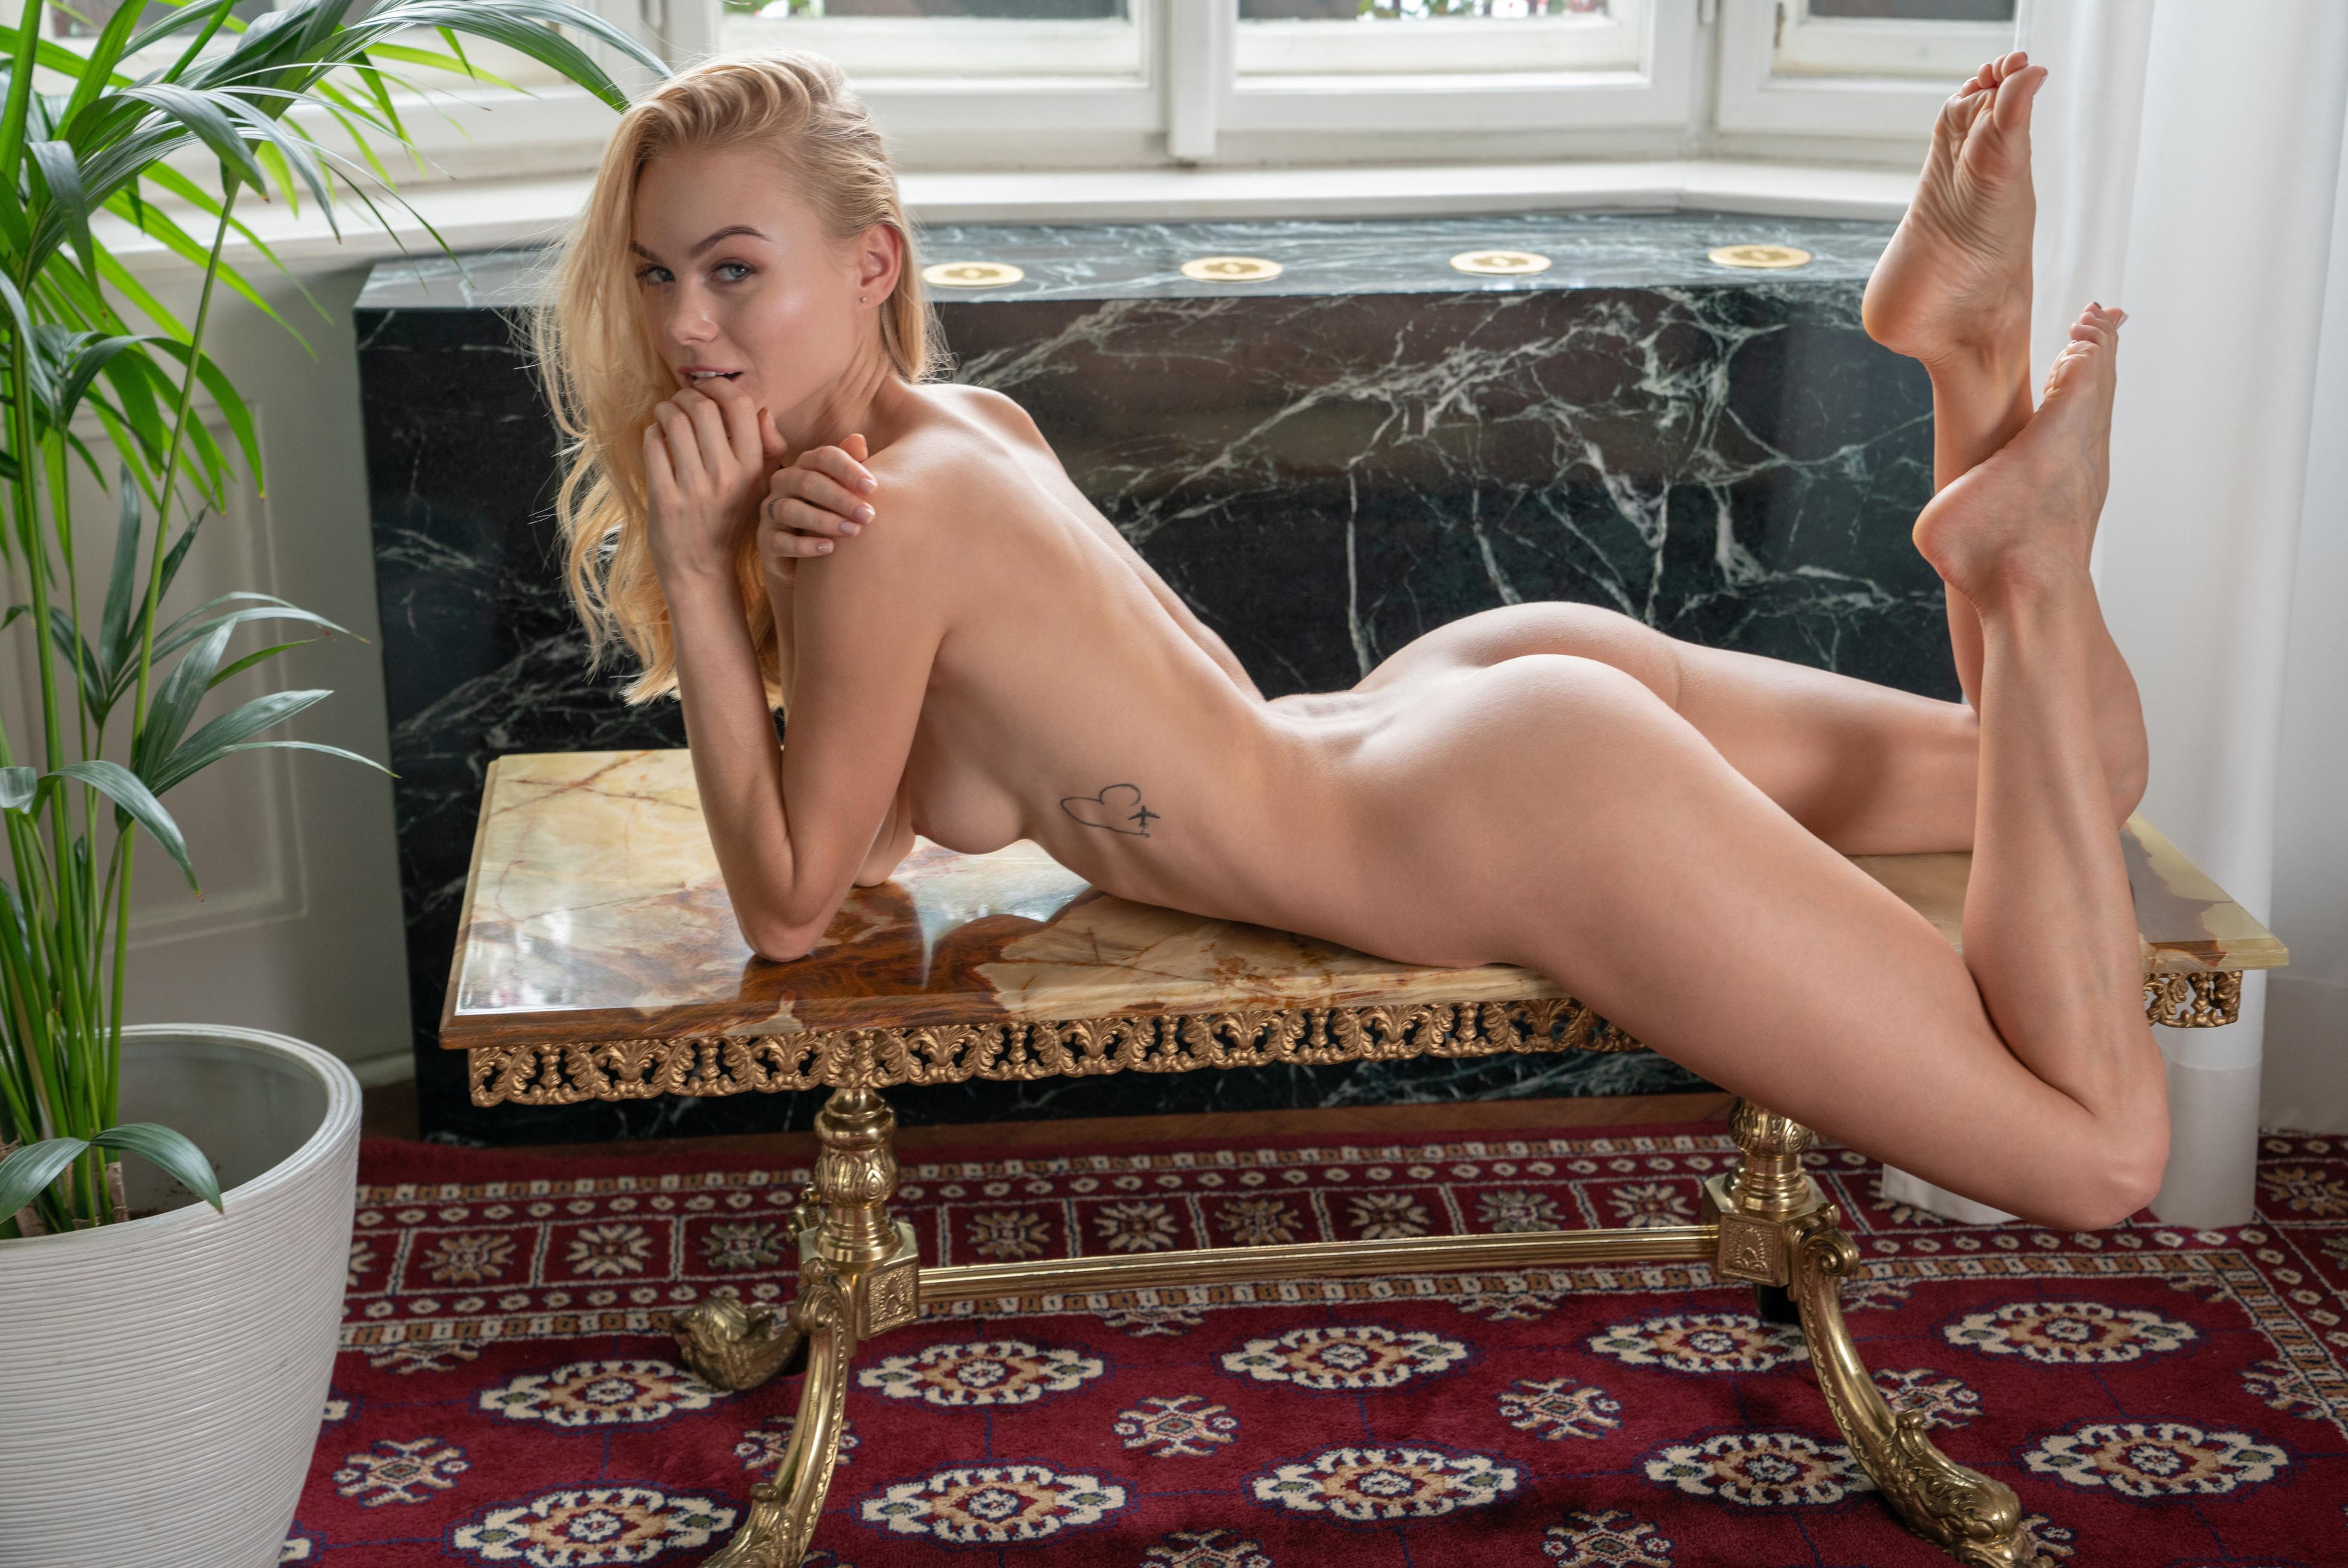 Joanie Laurer Nude By Taynaordohse On Deviantart